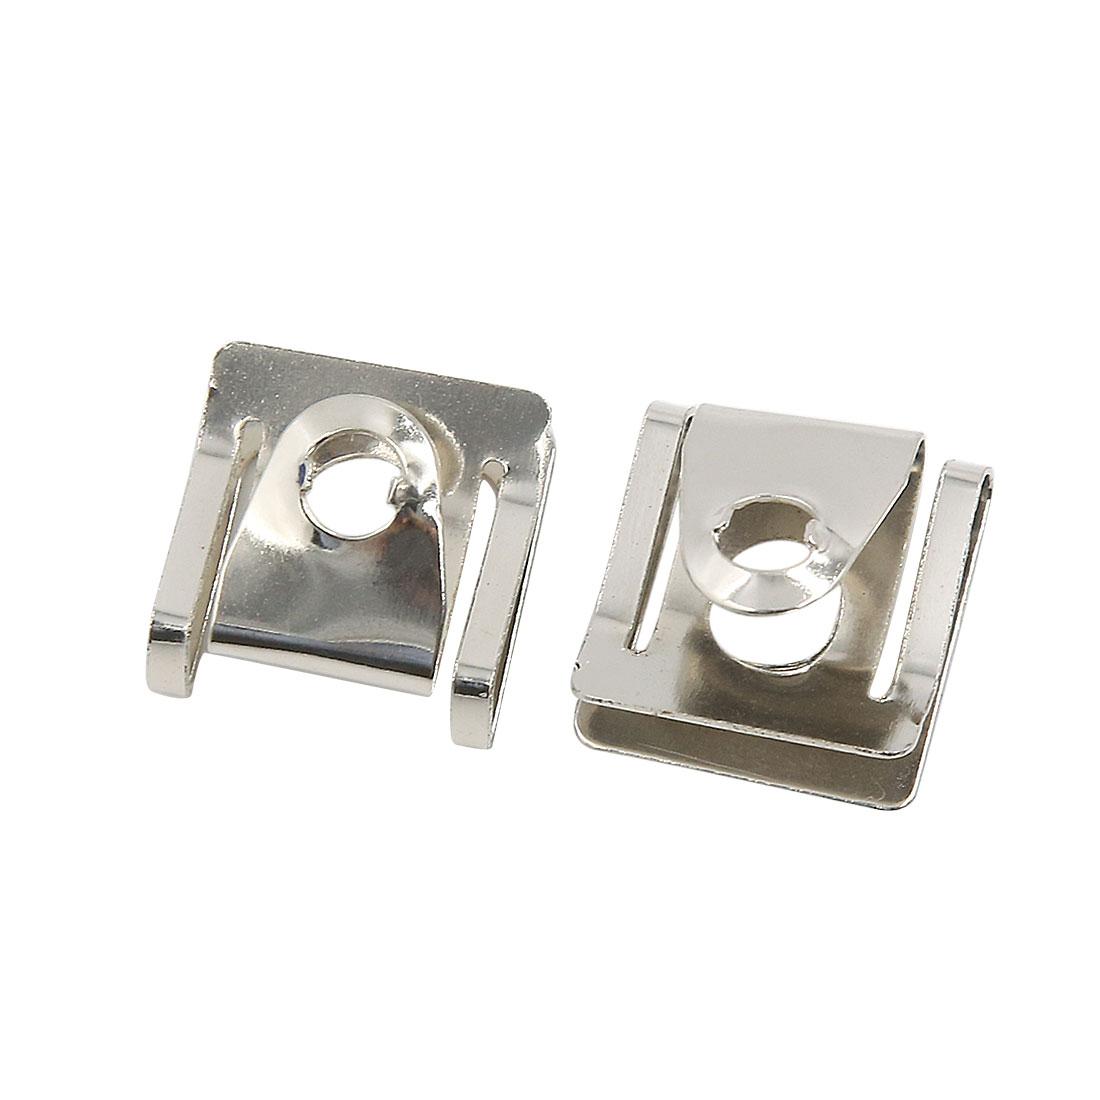 30 Pcs Silver Tone U-Type Rivets Door Panel Screw Fastener Clips 9mm Hole